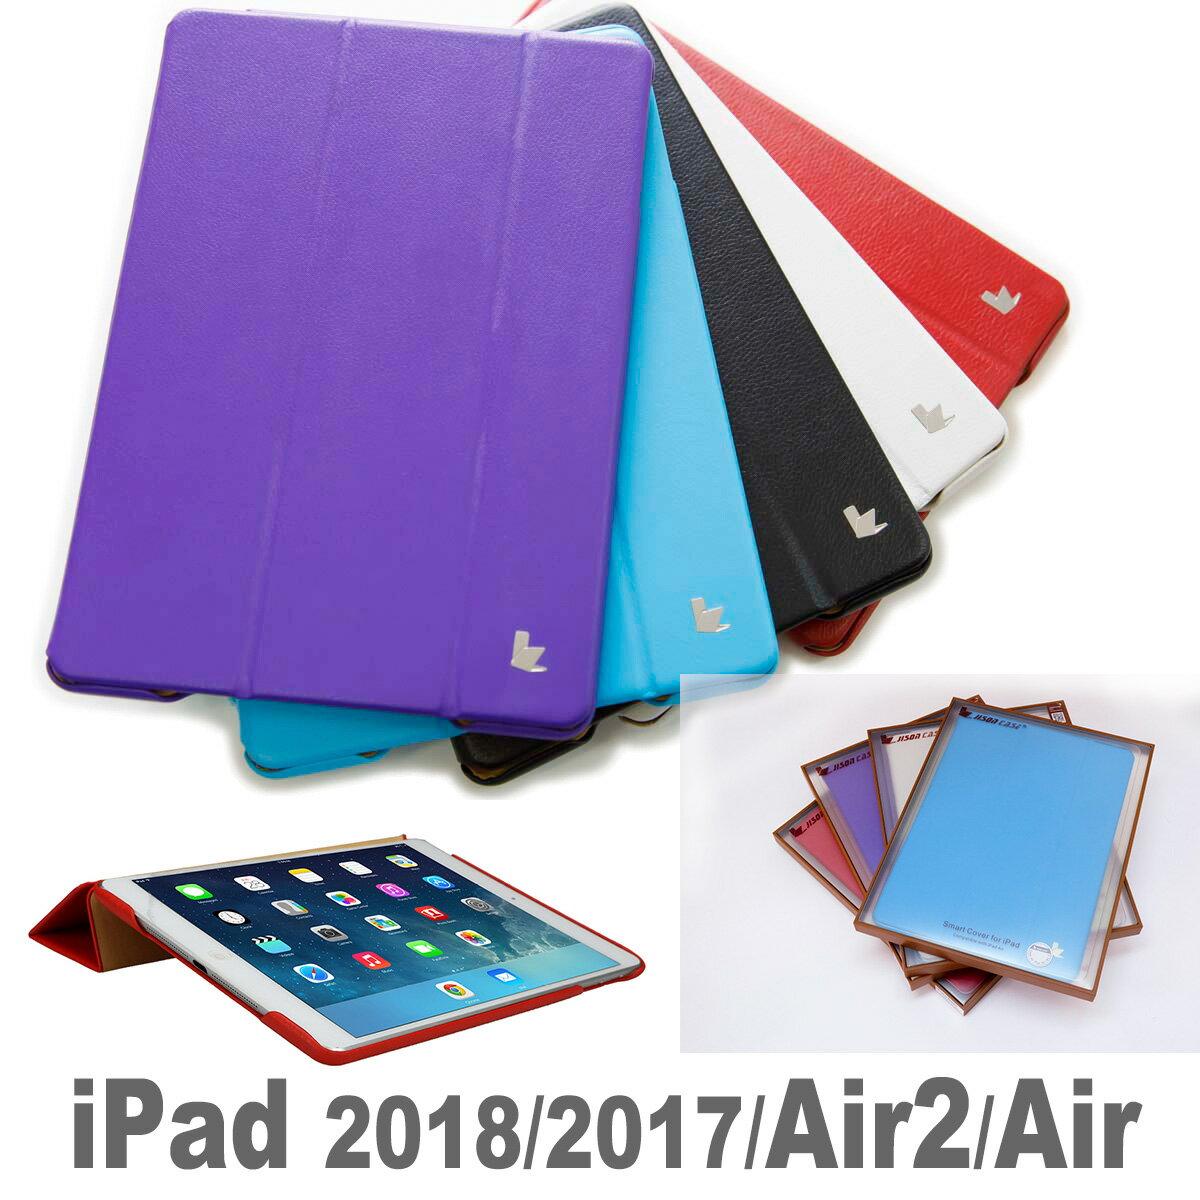 JS-ID6-04H 送料無料 JISONCASE ipad 2017 5世代 ipad Air Air2 ipad2017 ケース ipadケース カバー アイパッドエアー オートスリープ レザー